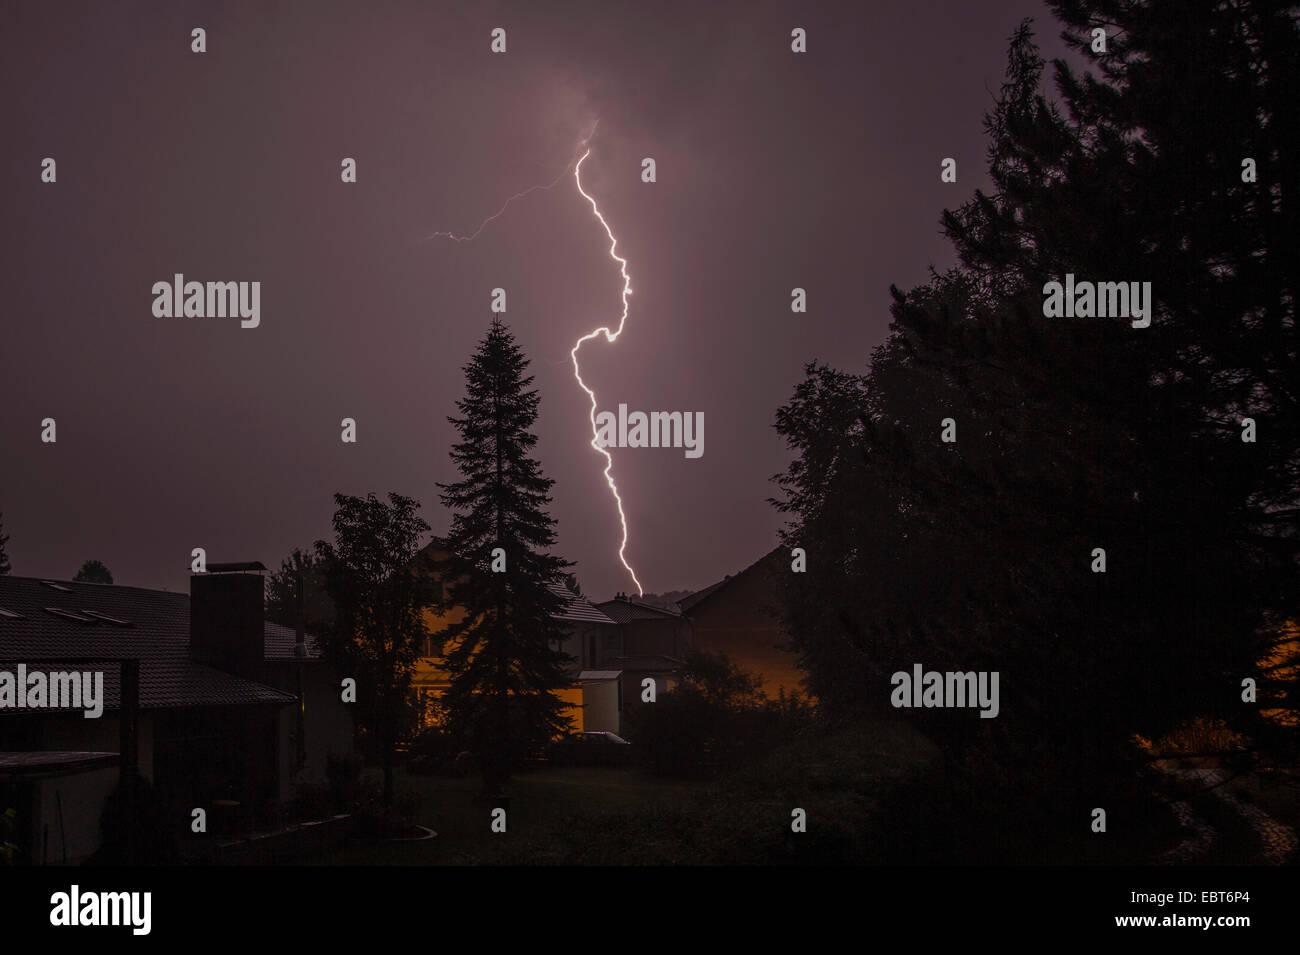 lightning strike in a housing area, Germany, Bavaria, Isental - Stock Image